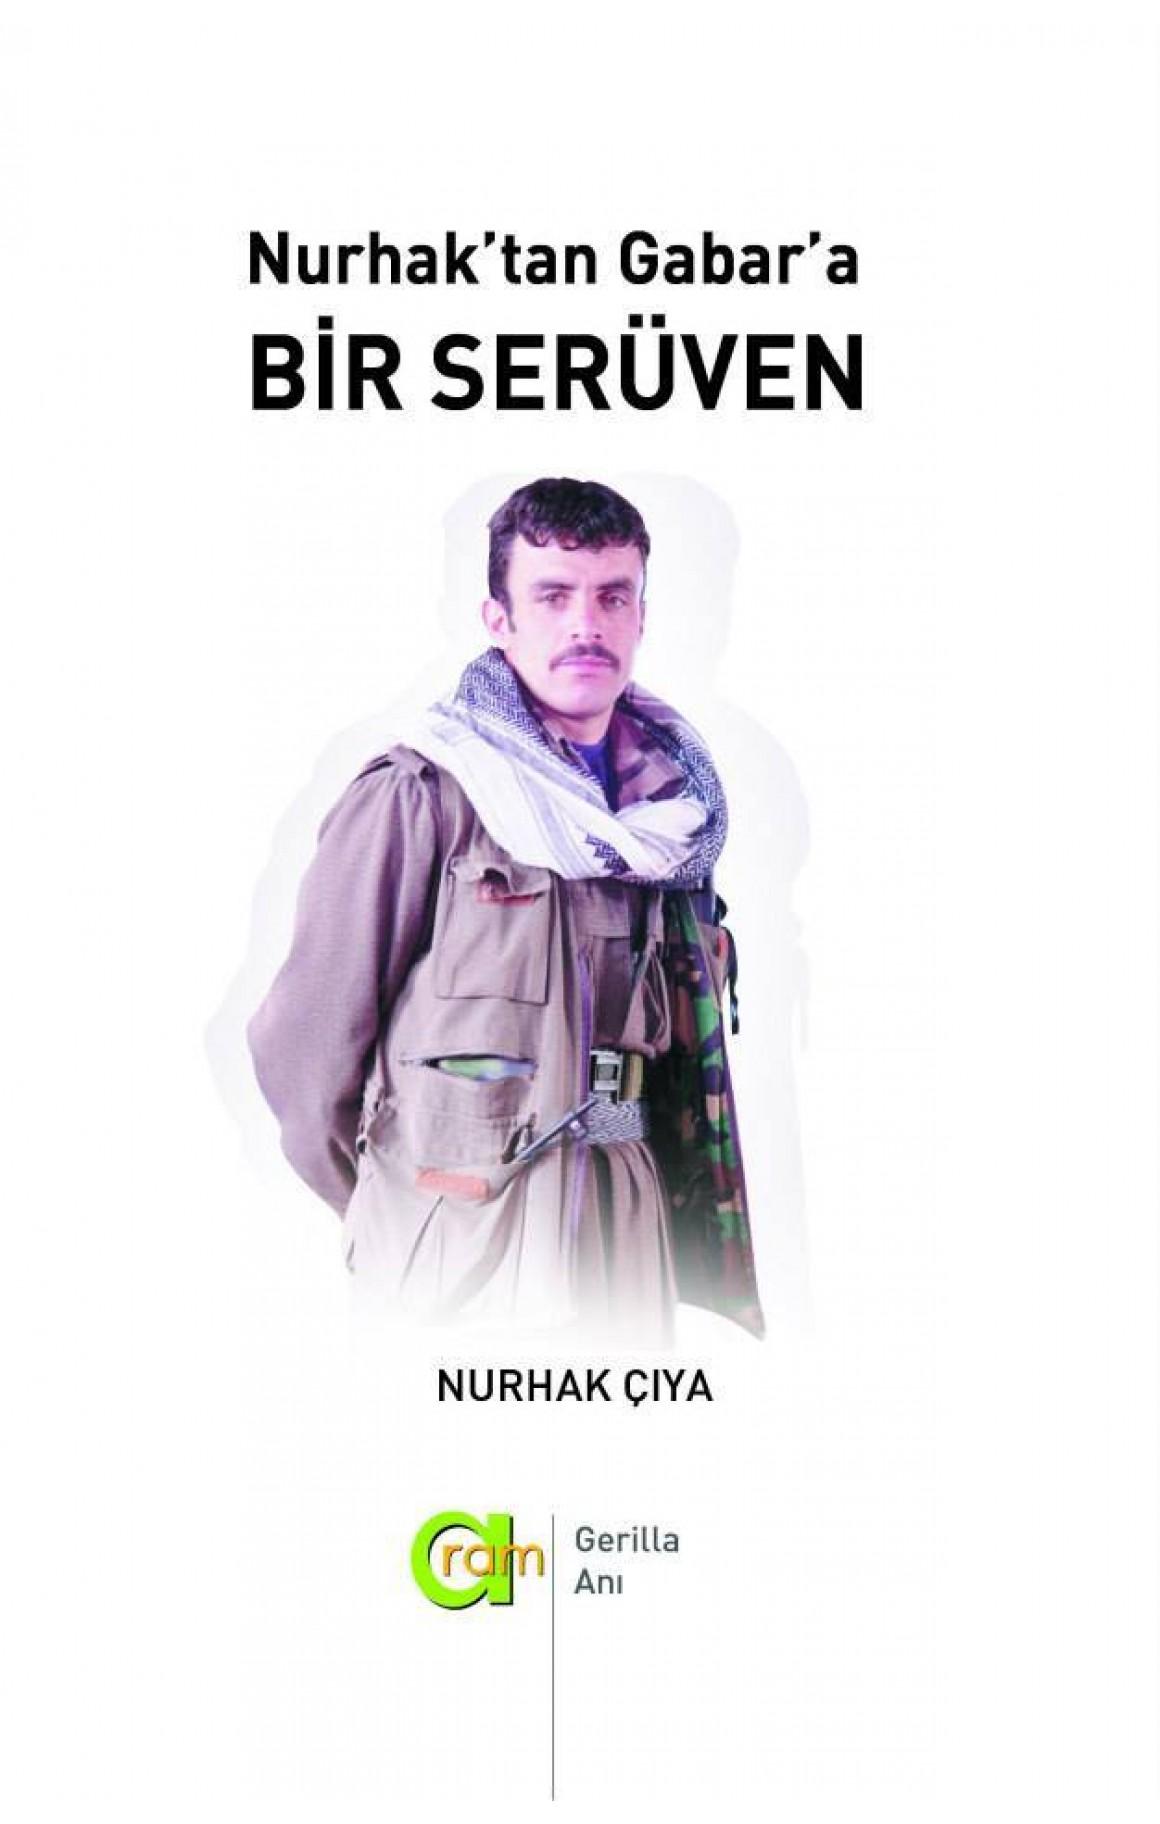 Nurhak'tan Gabara Serüven